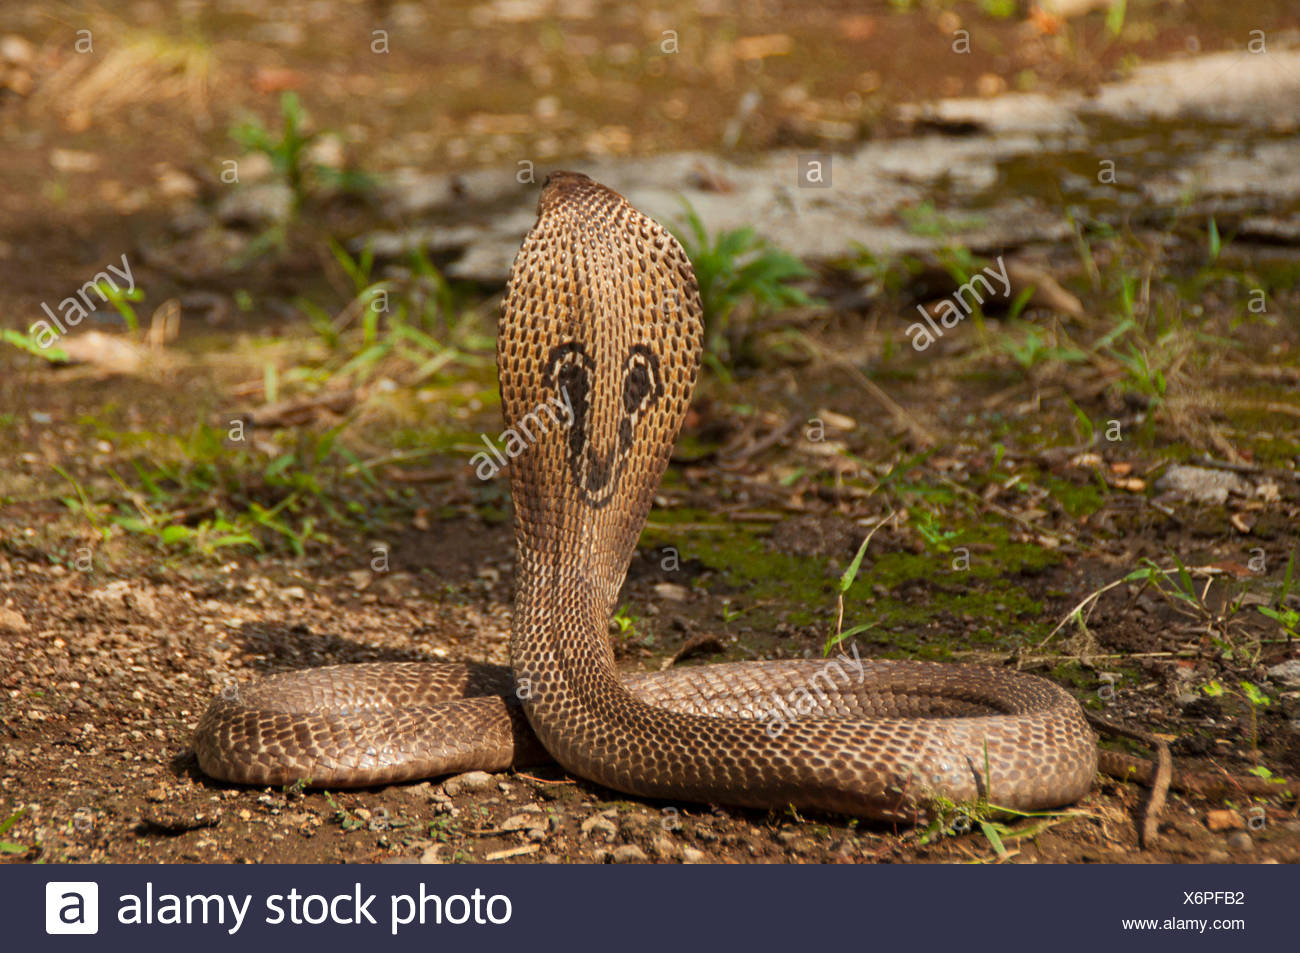 La cobra india (Naja naja), también conocido como el oso cobra, cobra o asiáticos binocellate cobra, india Foto de stock